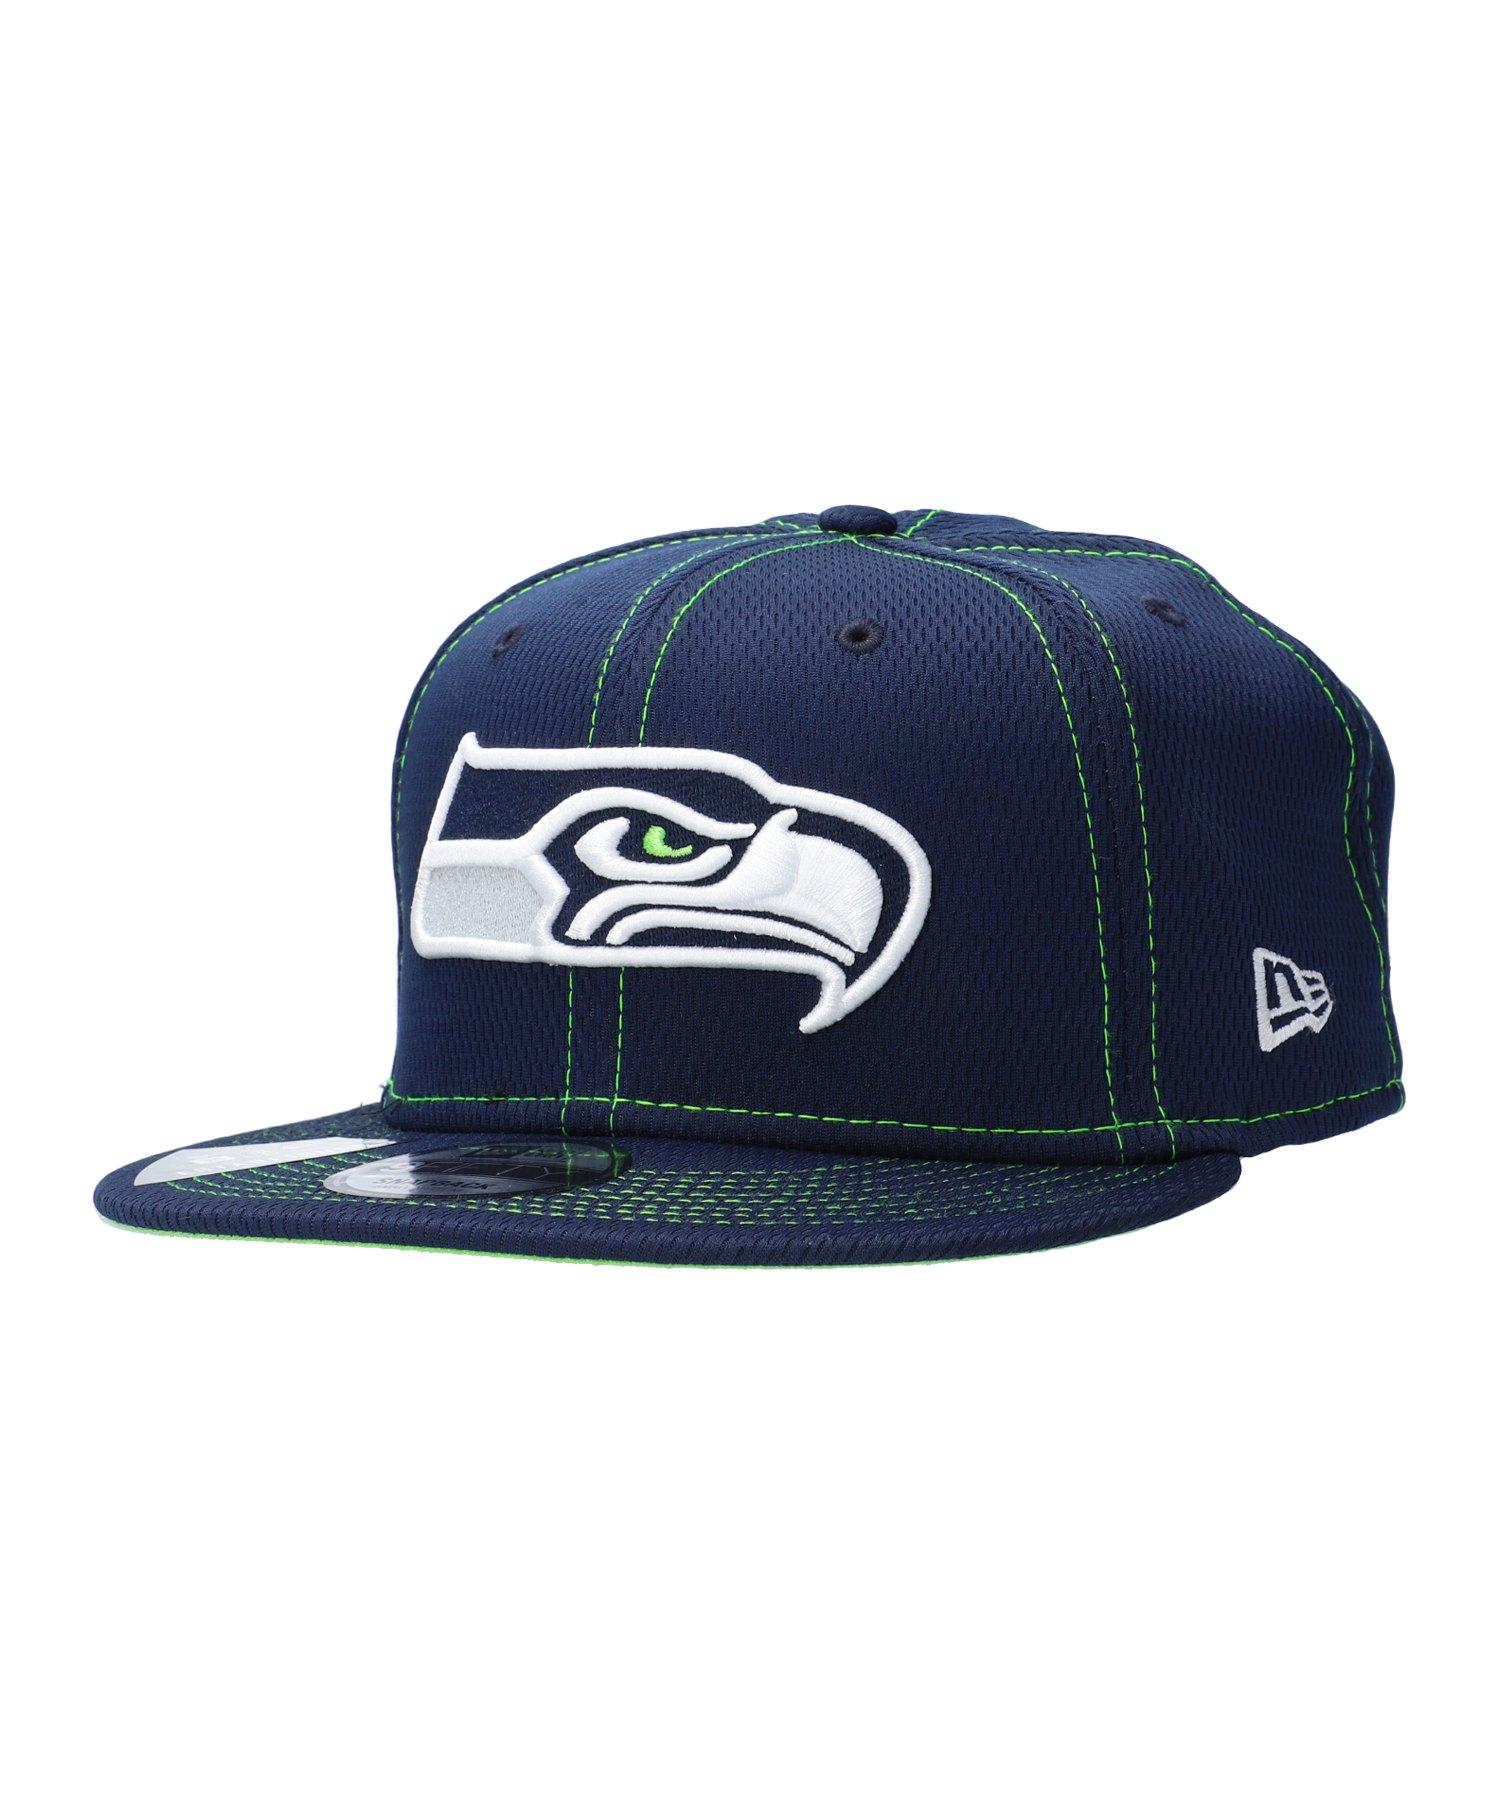 New Era NFL Seattle Seahawks 9Fifty OTC Cap Blau - blau